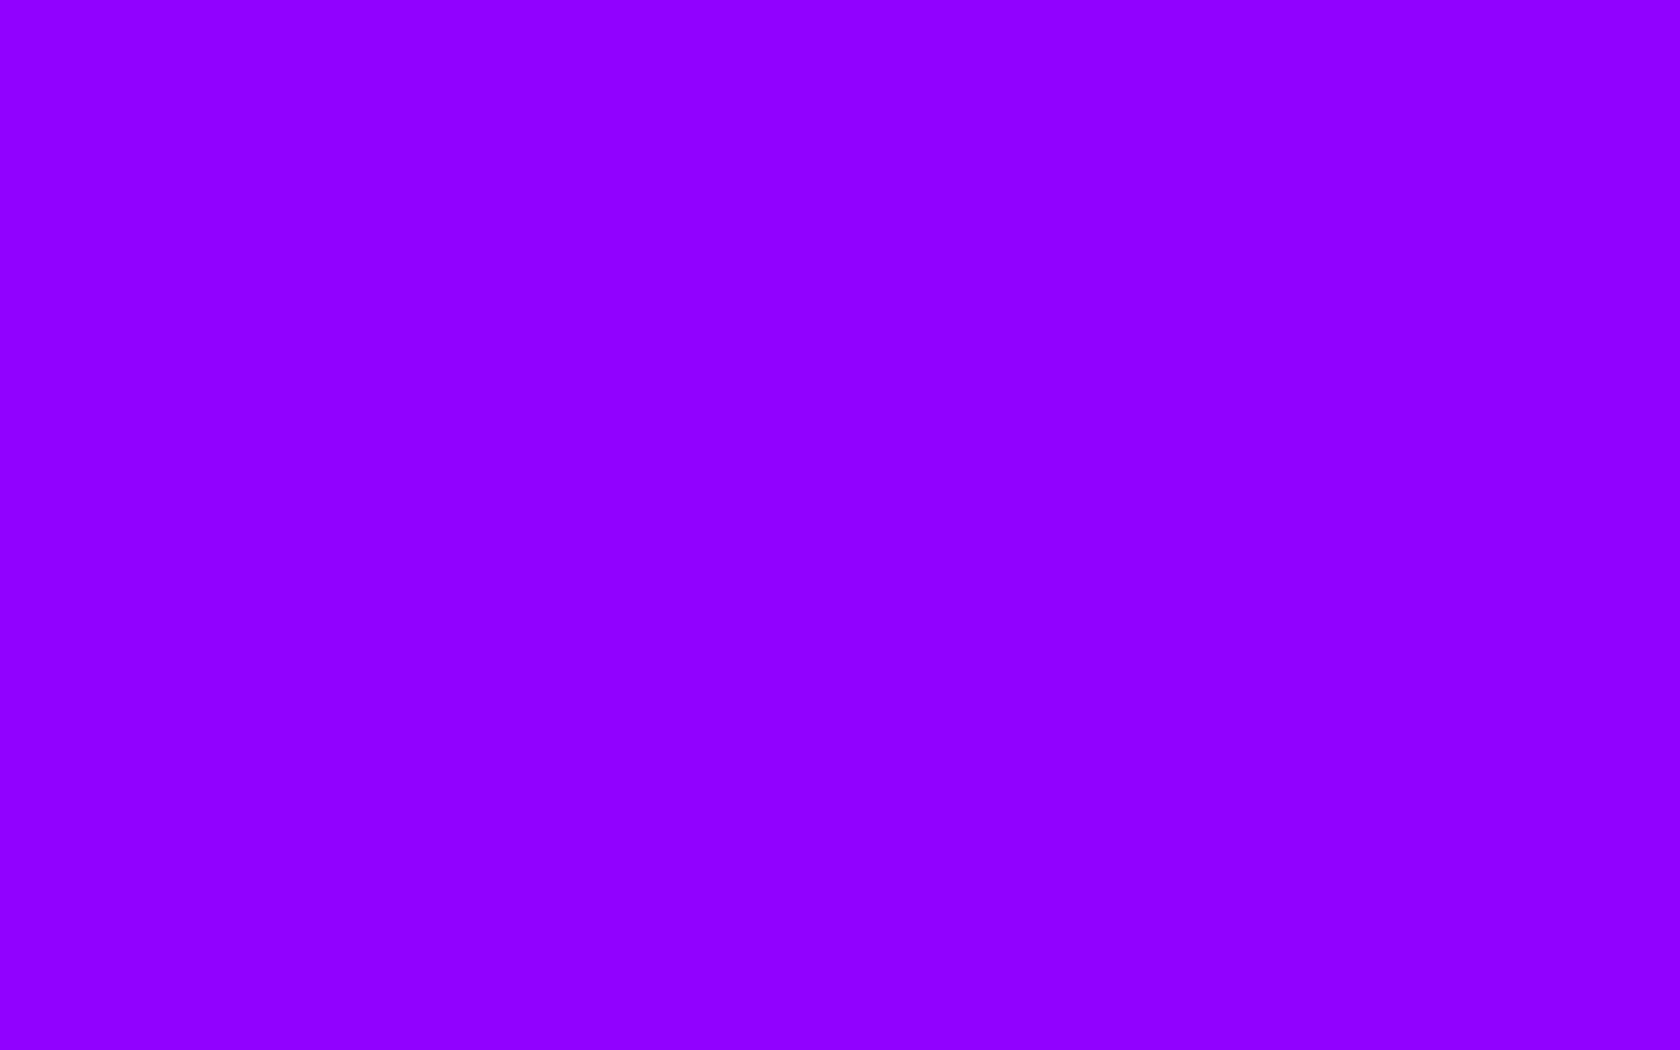 1680x1050 Electric Violet Solid Color Background